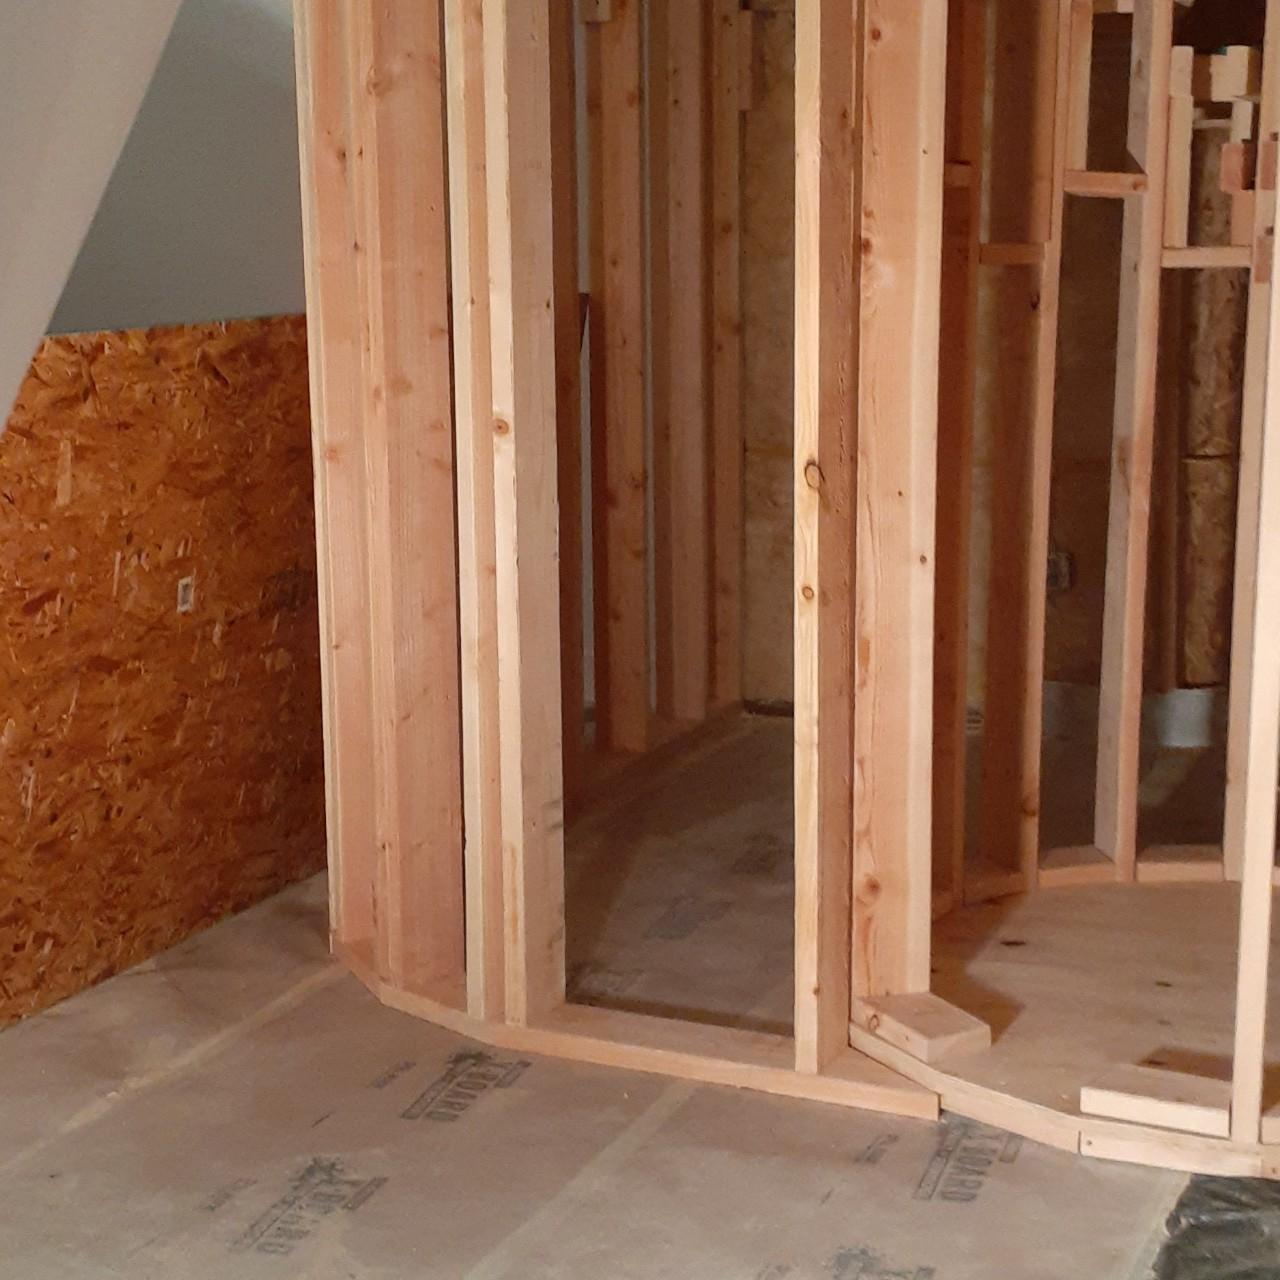 carpentry-wood-framing-second-floor-home-addition--framing-34